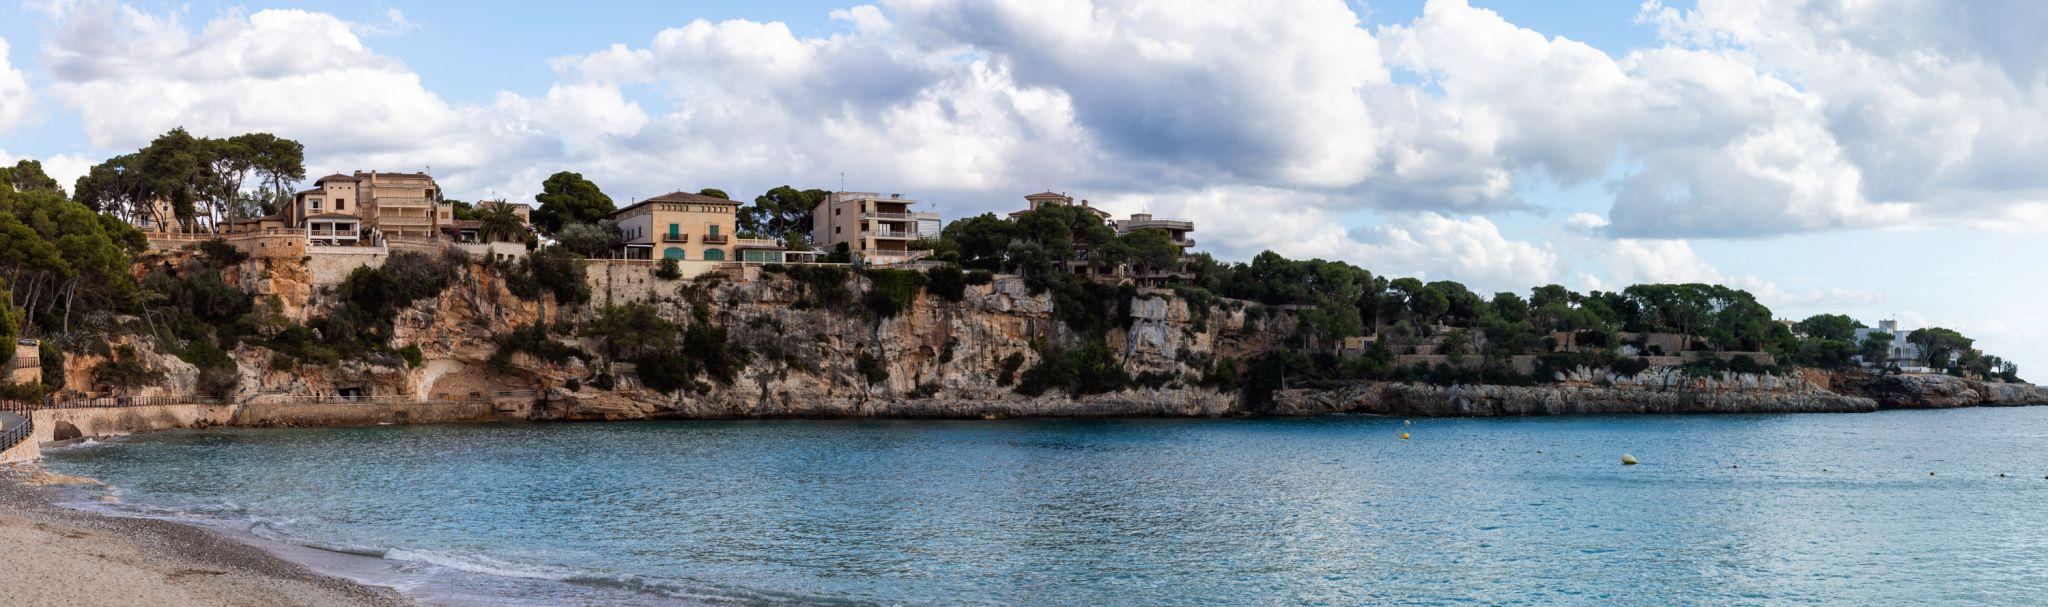 Hafen von Porto Christo auf Mallorca, Spain